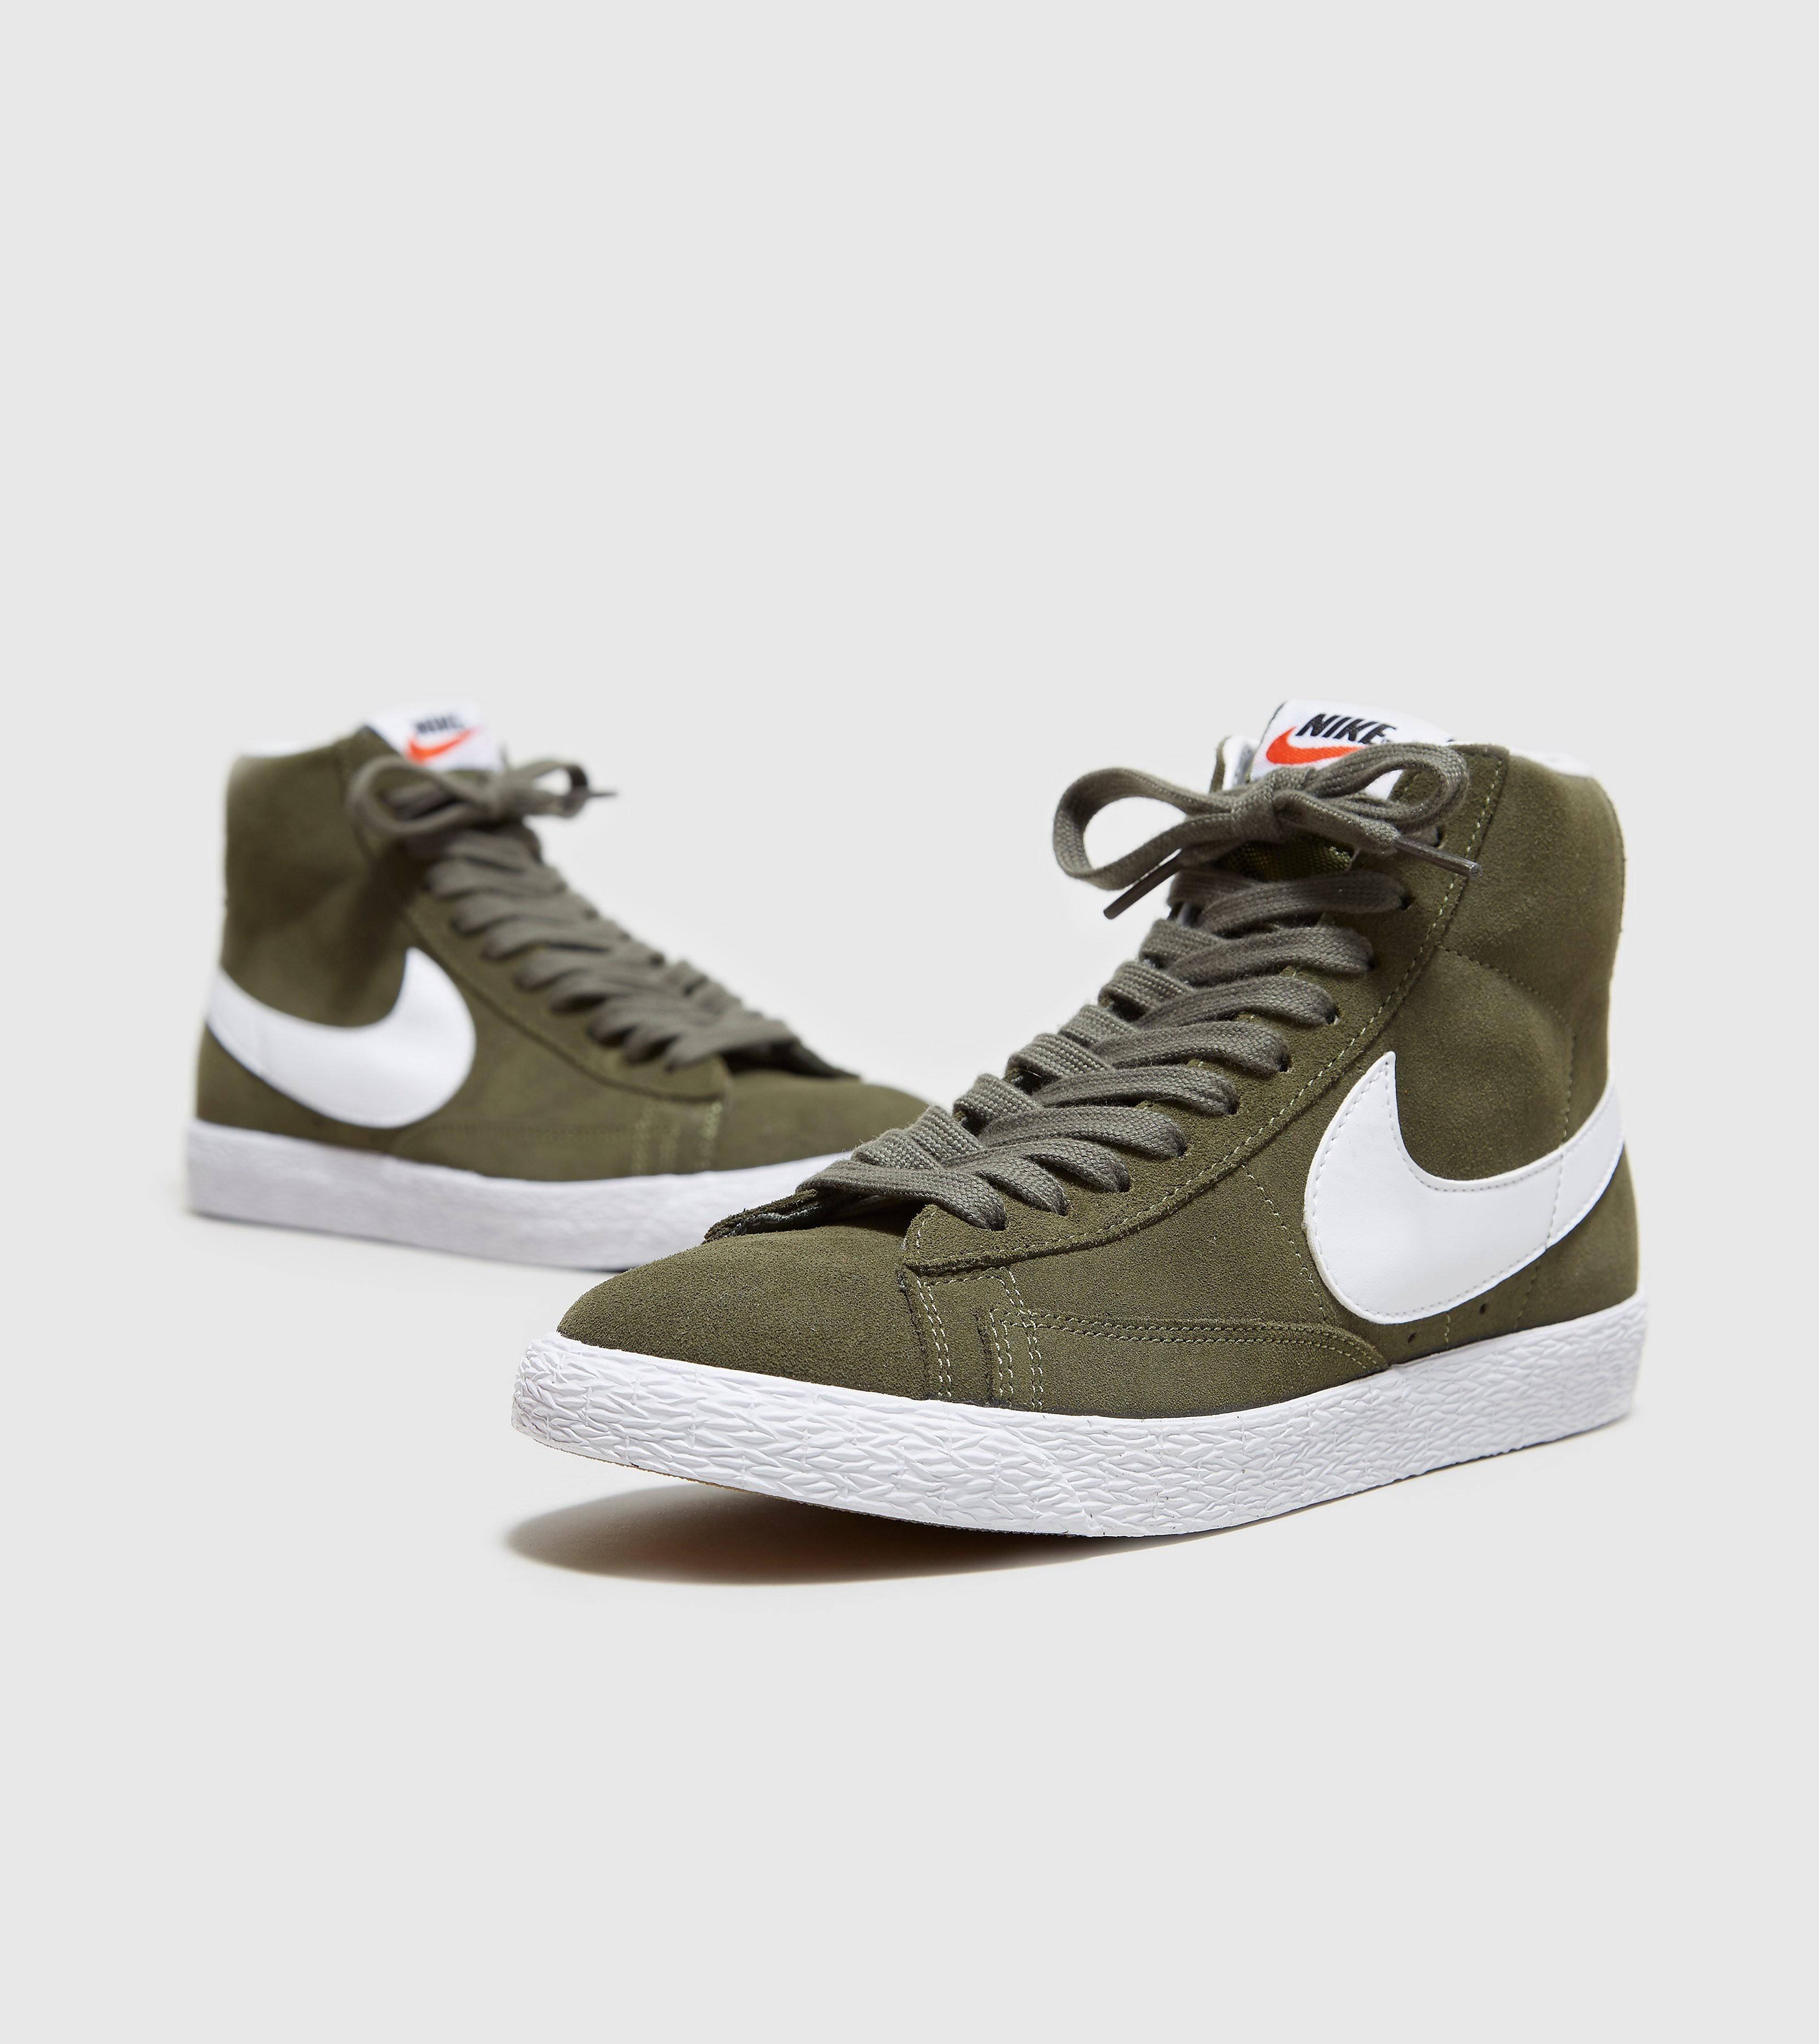 Nike Blazer Mid Suede Women's